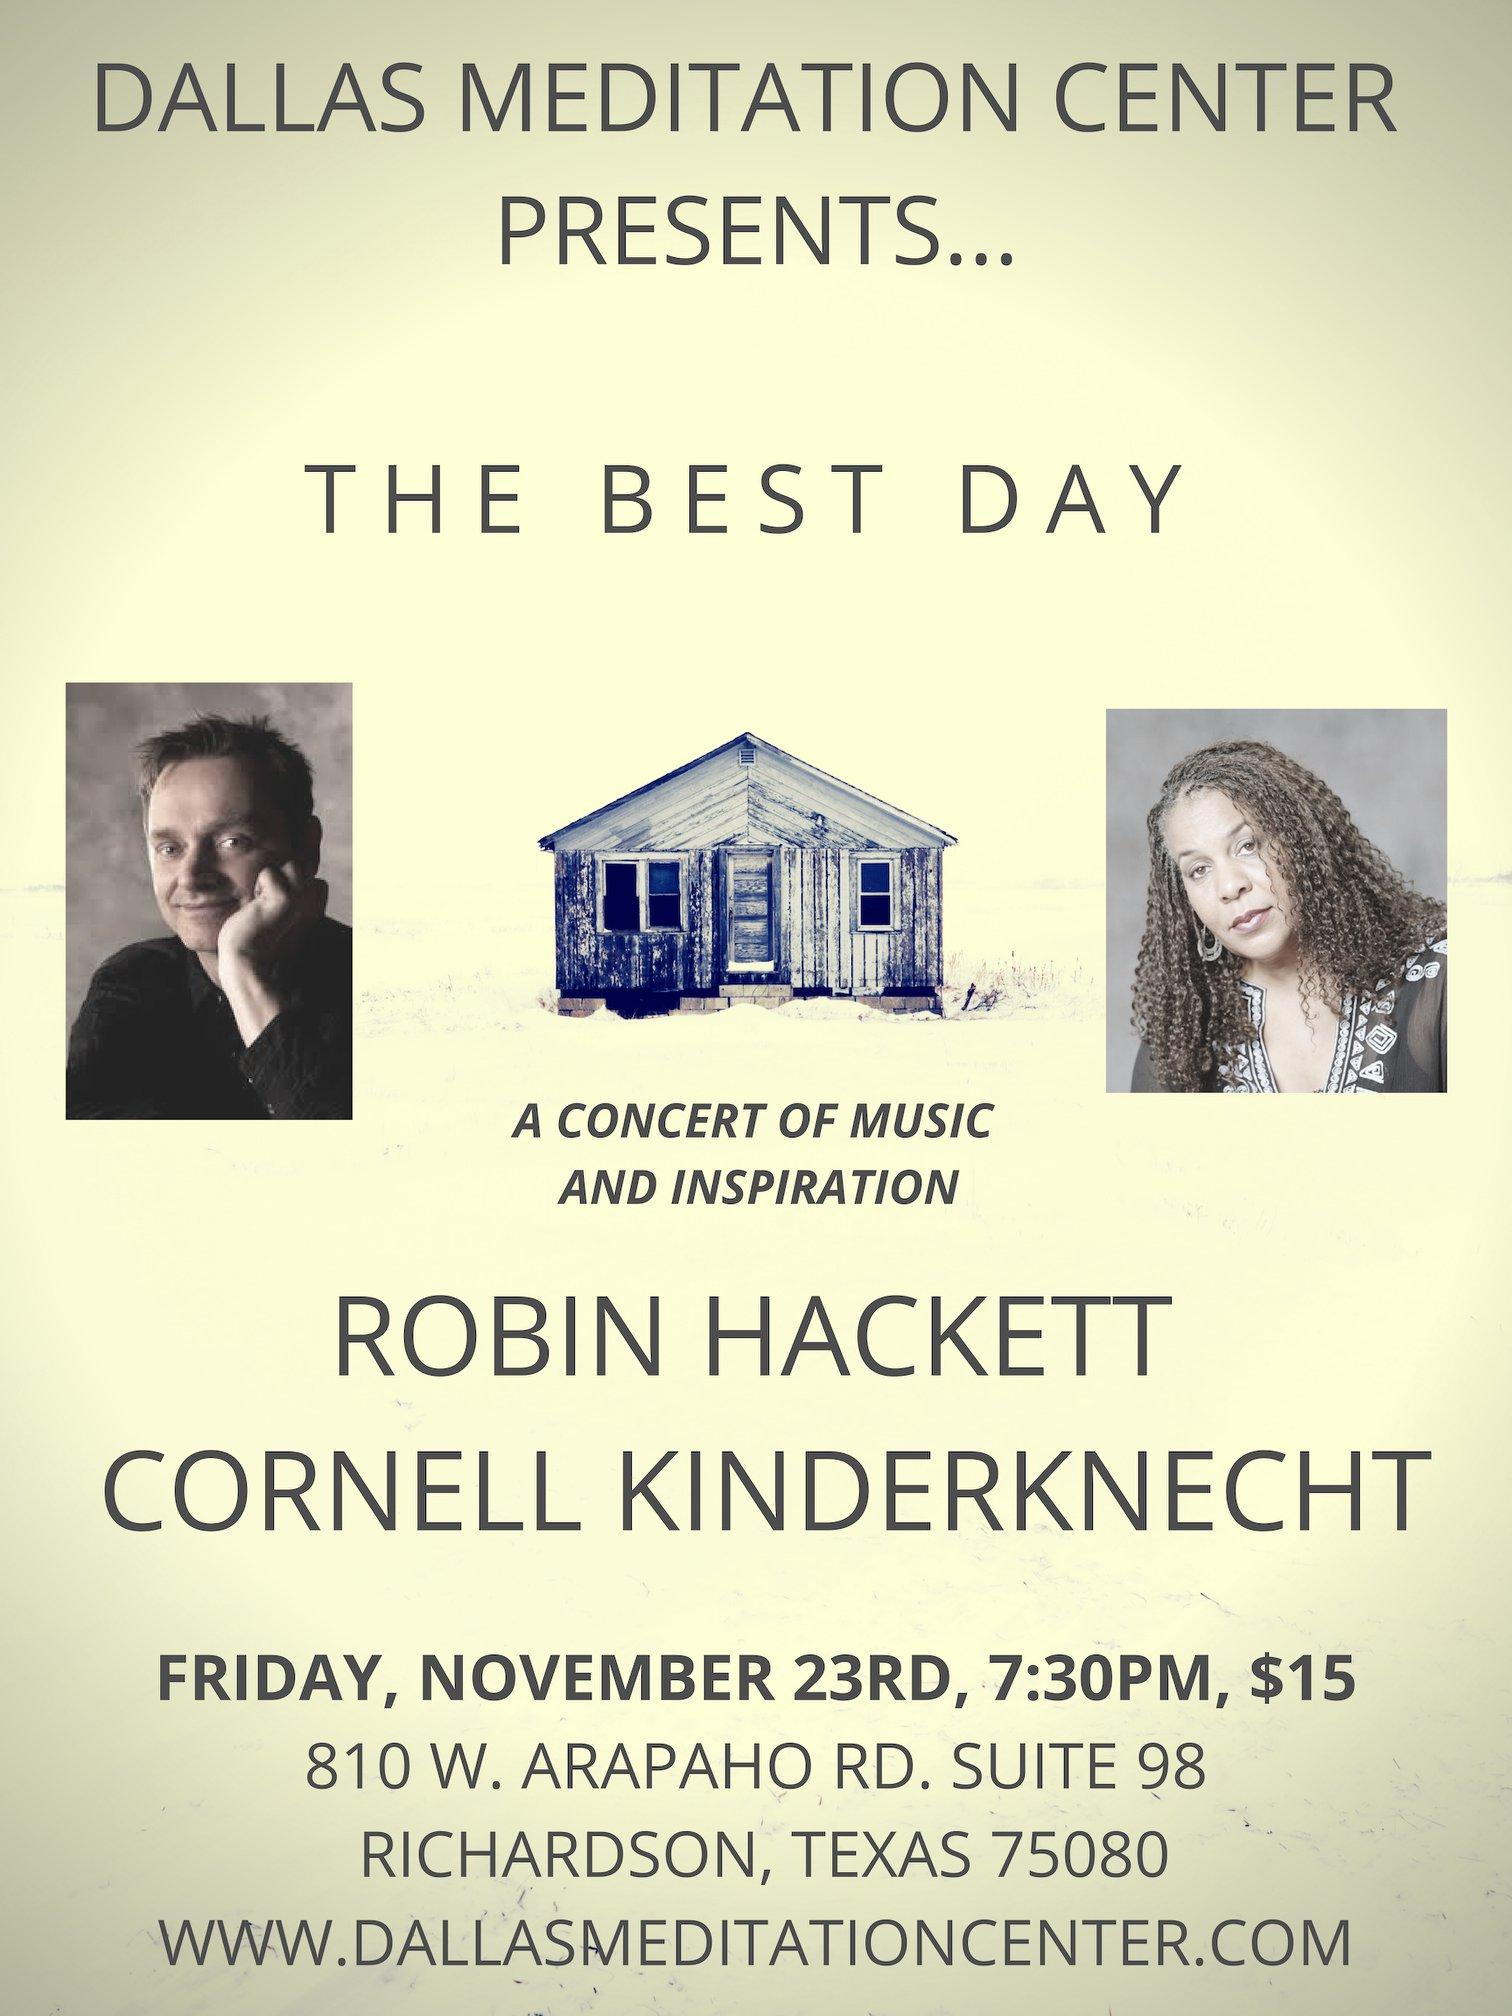 Evening Concert with Robin Hackett and Cornell Kinderknecht - November 23, 2018 - Richardson/Dallas, Texas